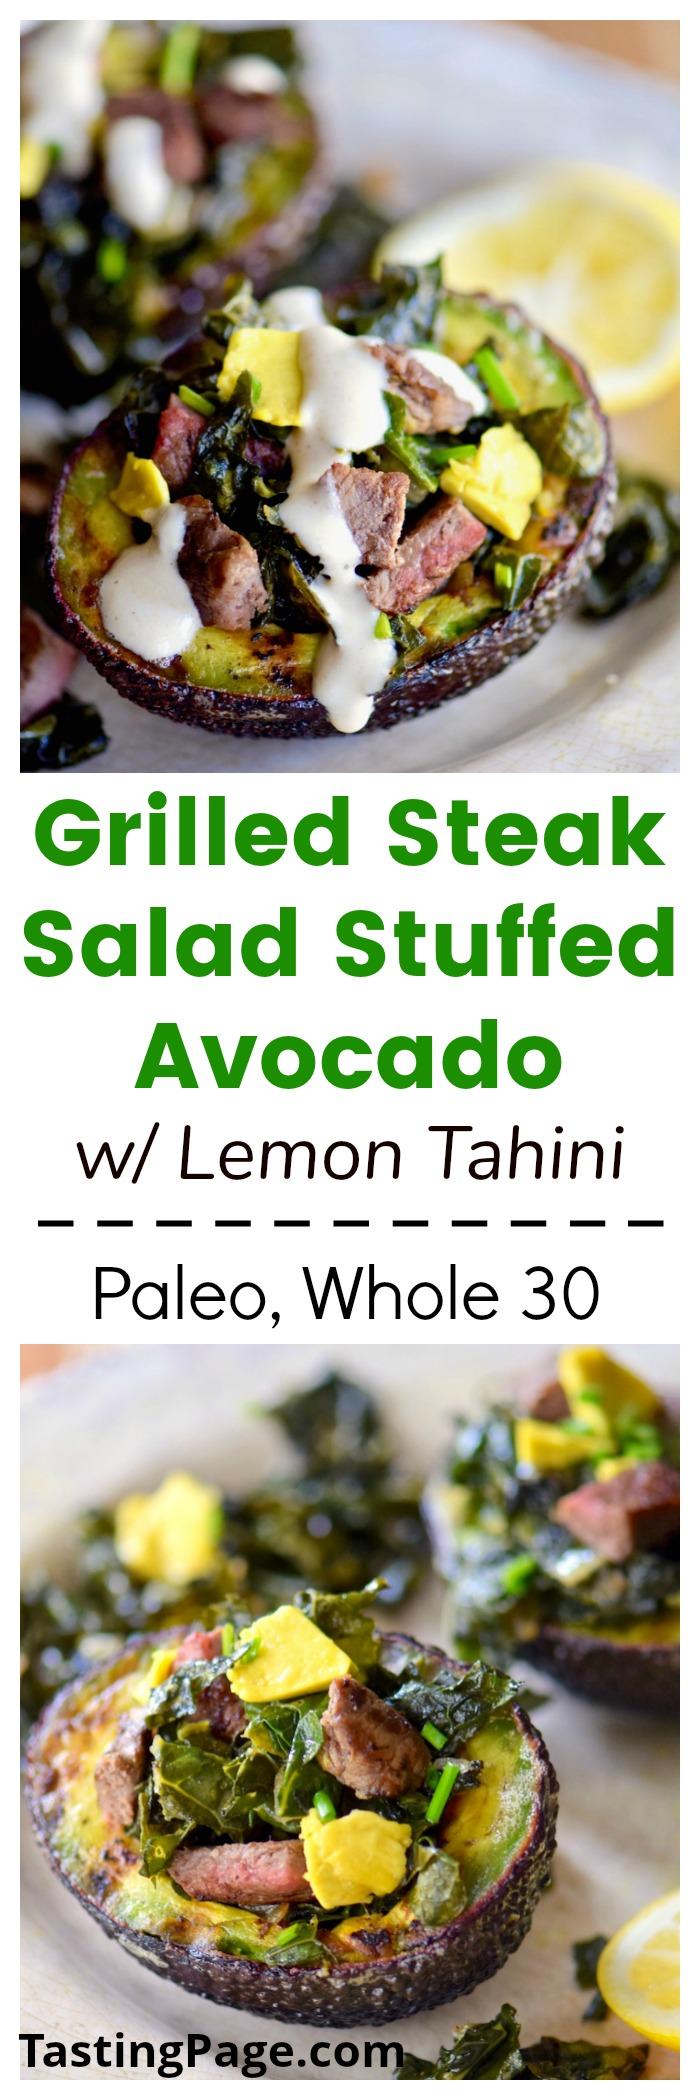 Grilled steak salad stuffed avocado - paleo, whole 30, gluten free, dairy free | TastingPage.com